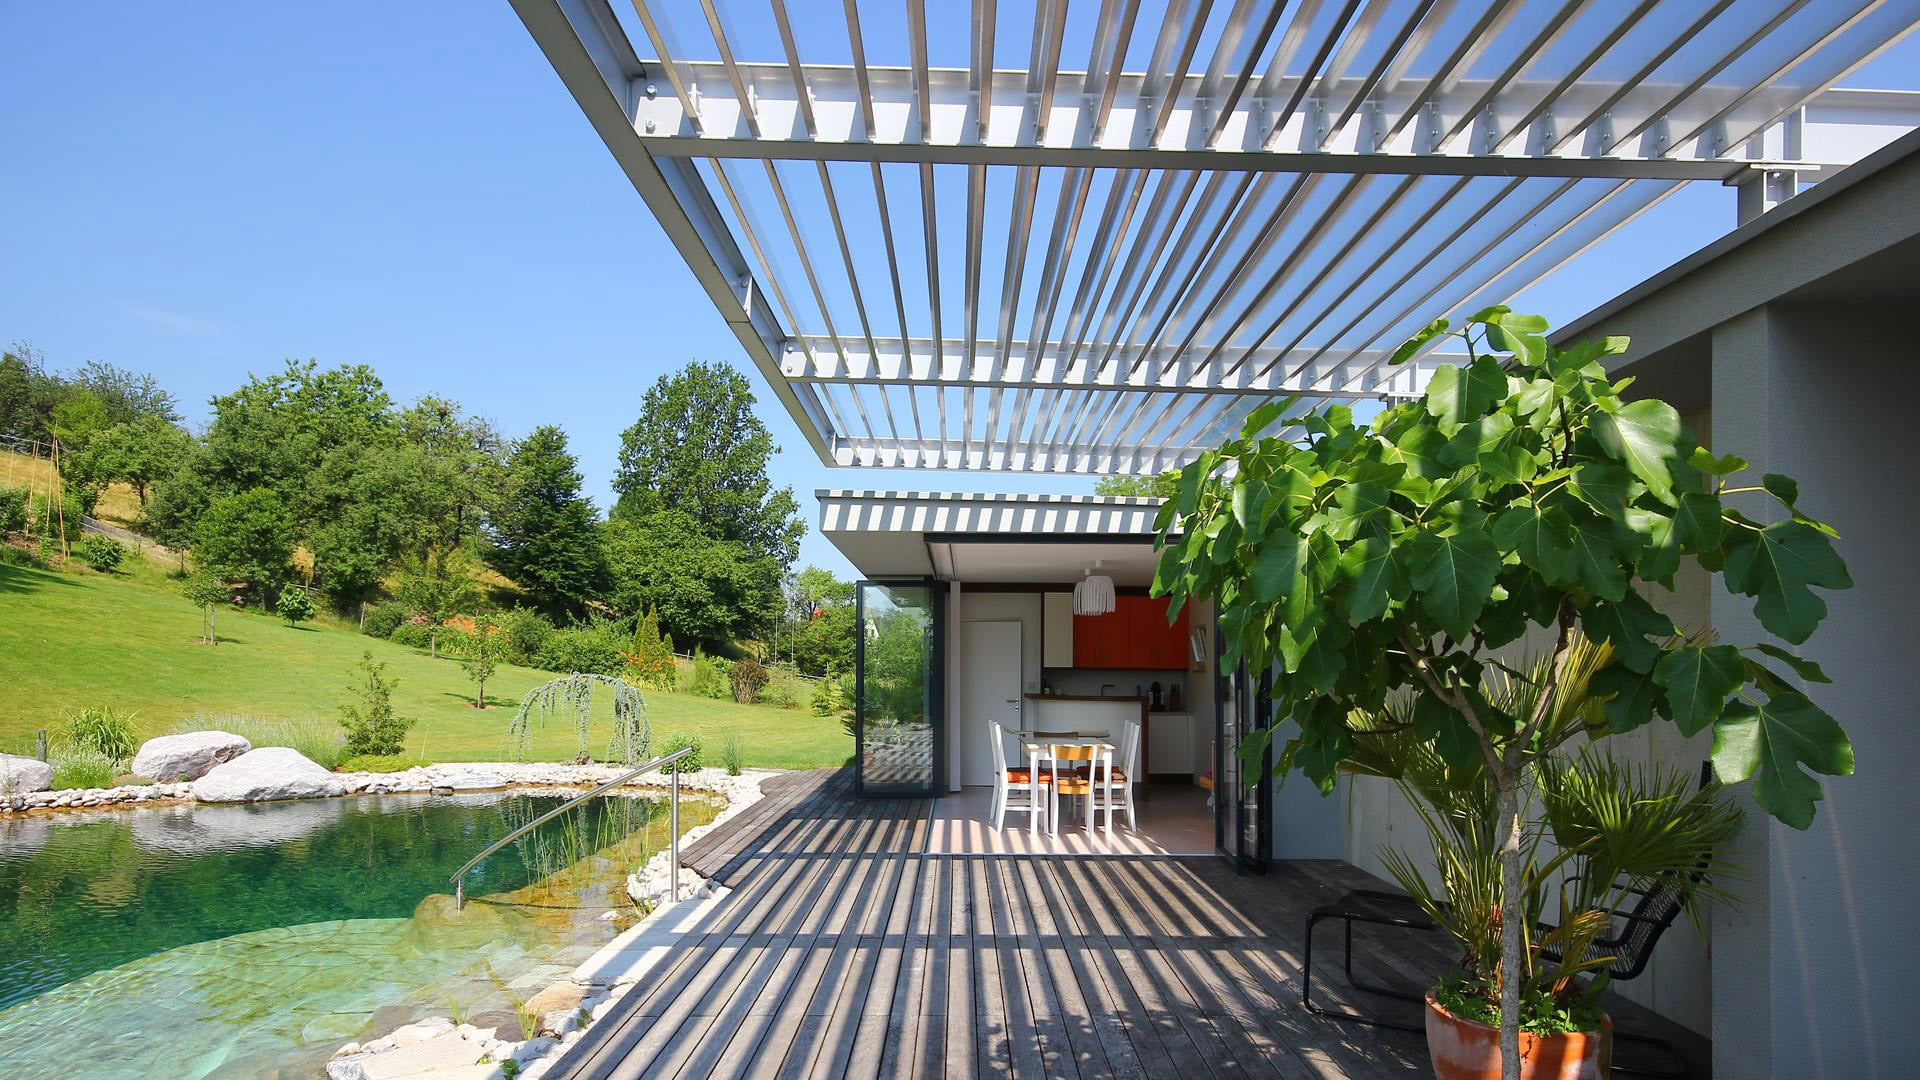 Terrassendach Alu 74 b   moderne Sonderanfertigung mit fixen Aluminium-Lamellen, weiß   Svoboda